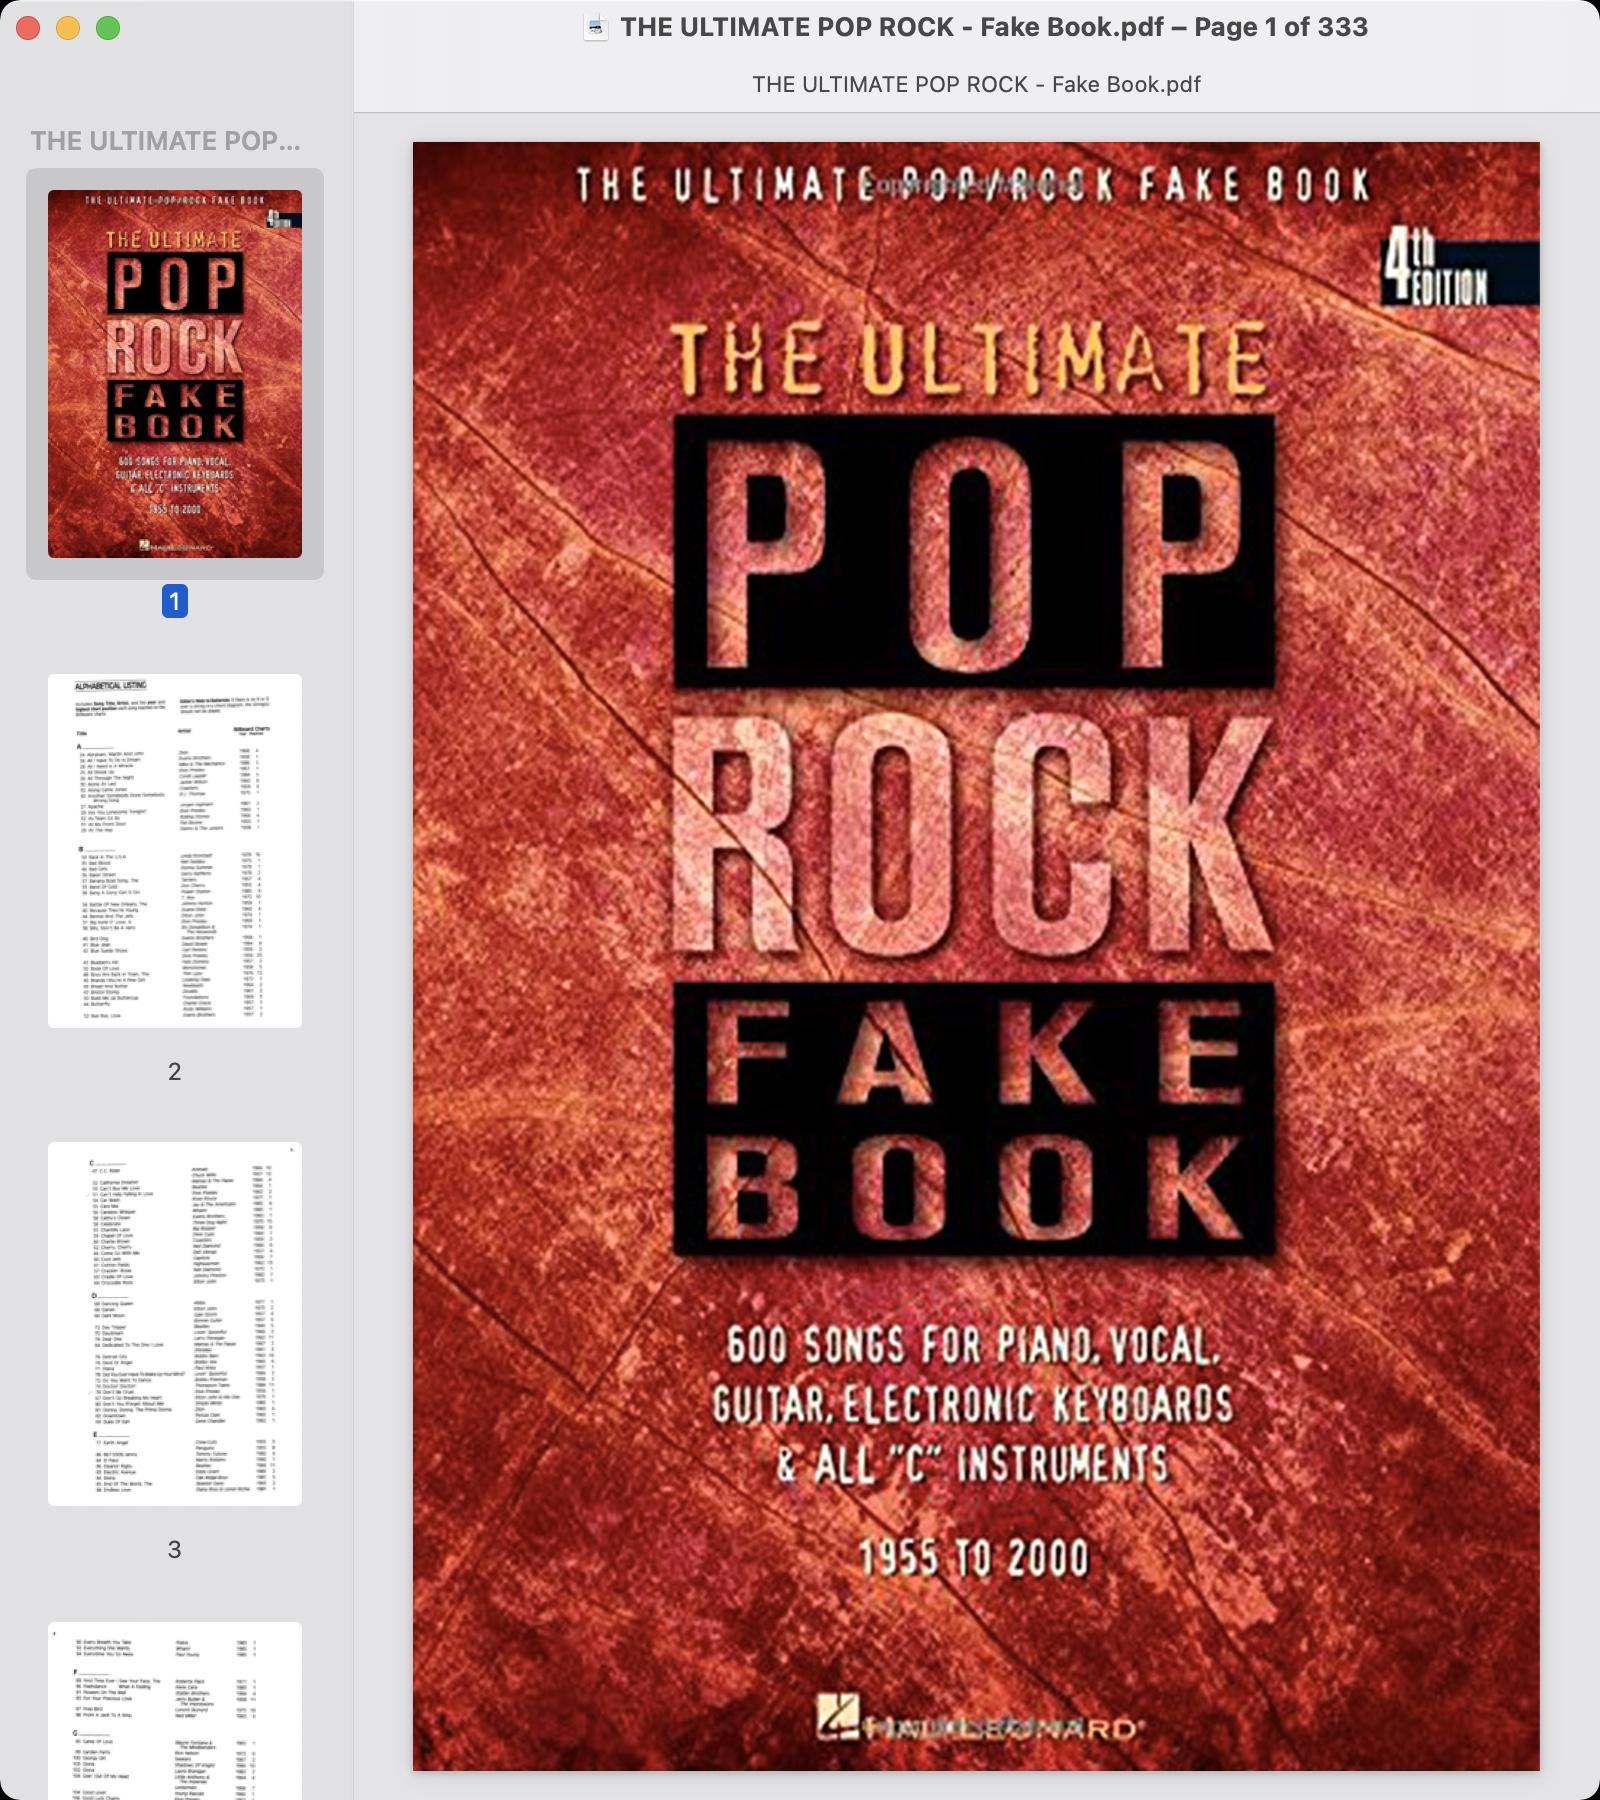 THE ULTIMATE POP ROCK - Fake Book.jpg